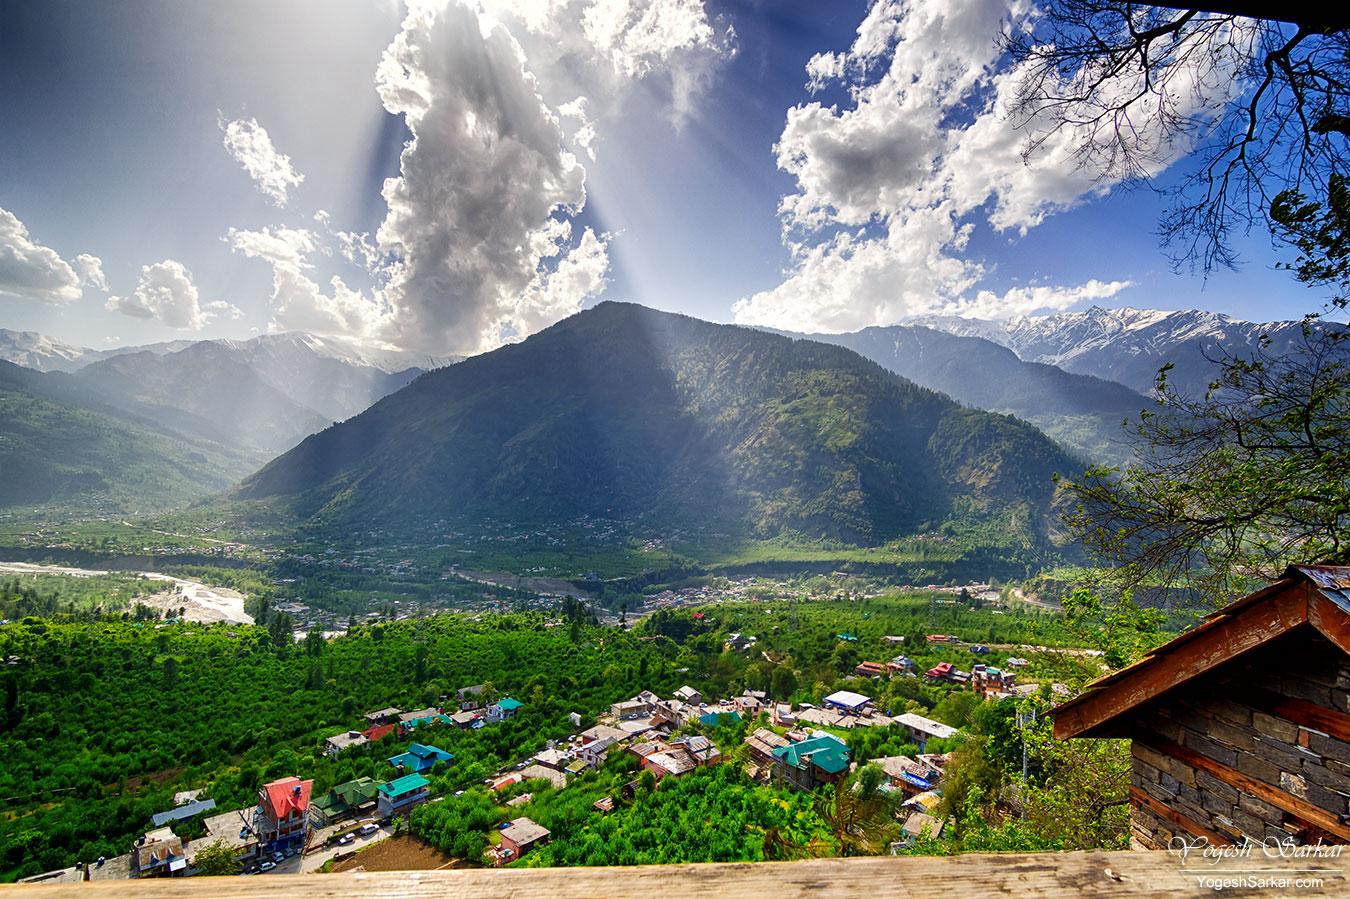 01-naggar-himachal-pradesh.jpg